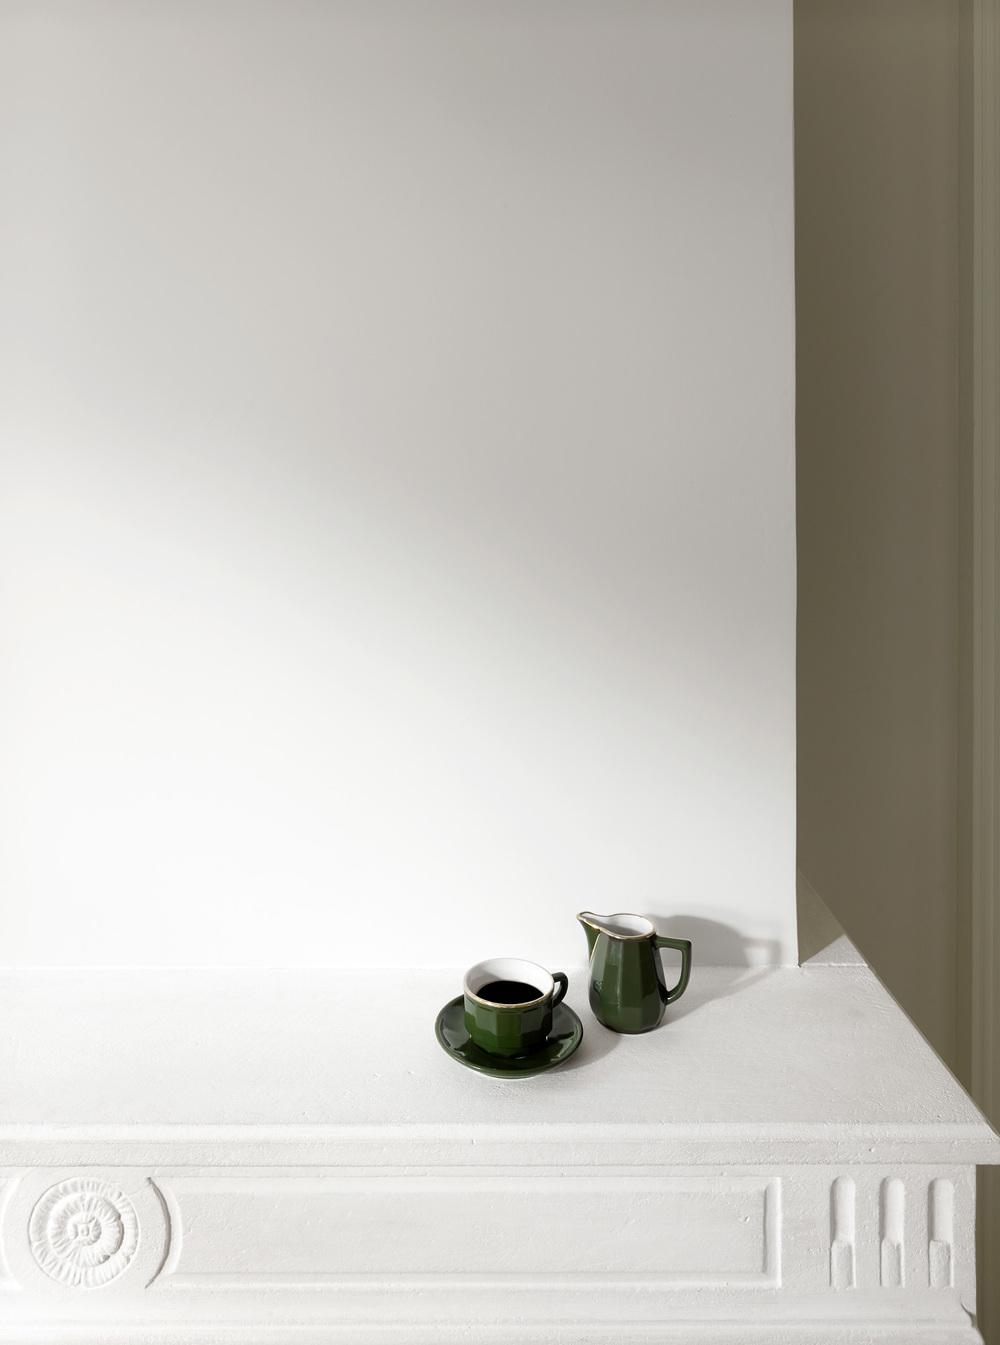 Aesthete Curator - Vercruysse 02.jpg